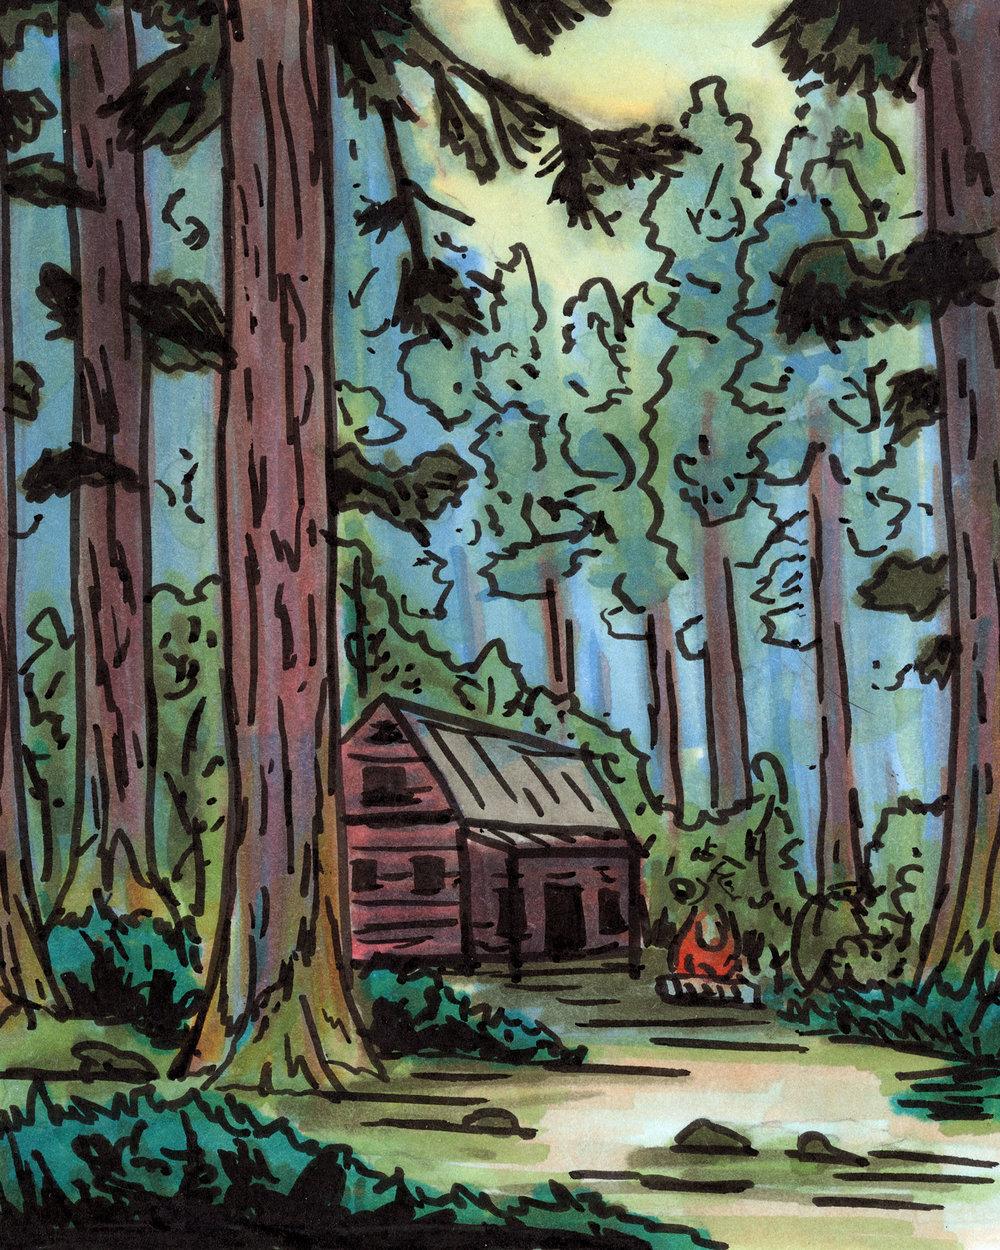 Cabin-in-the-woods_web.jpg